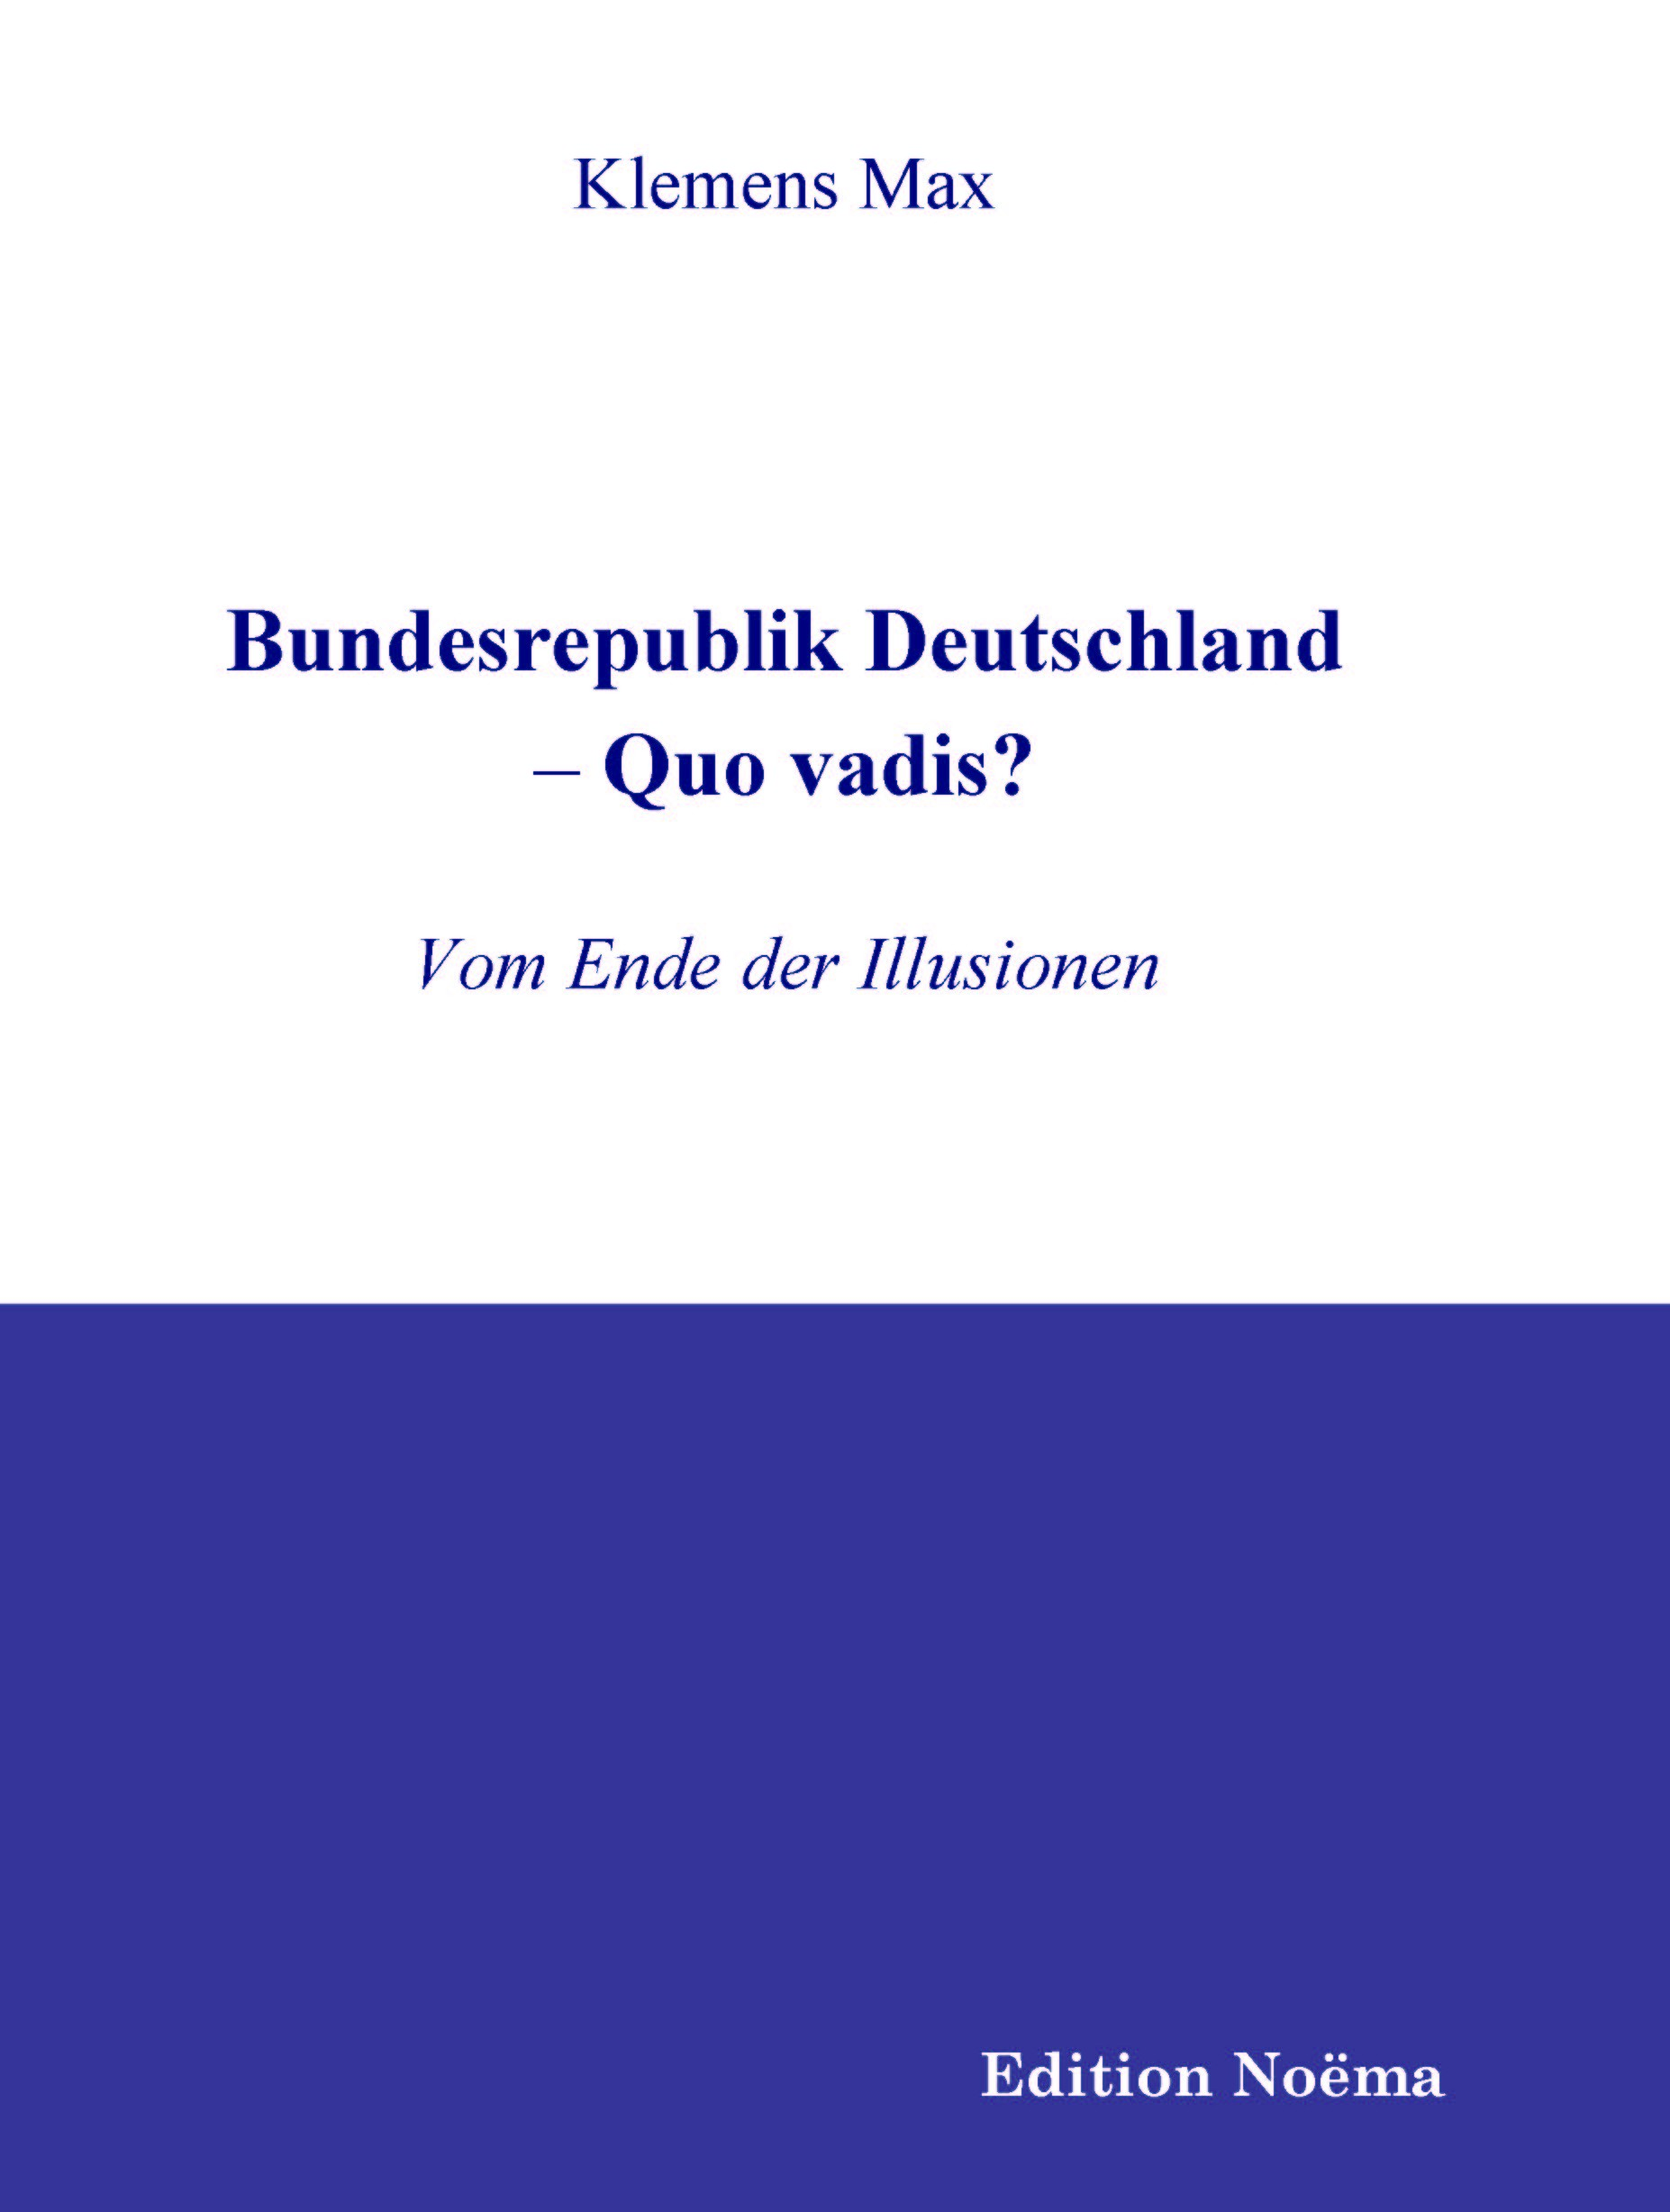 Bundesrepublik Deutschland – Quo vadis?